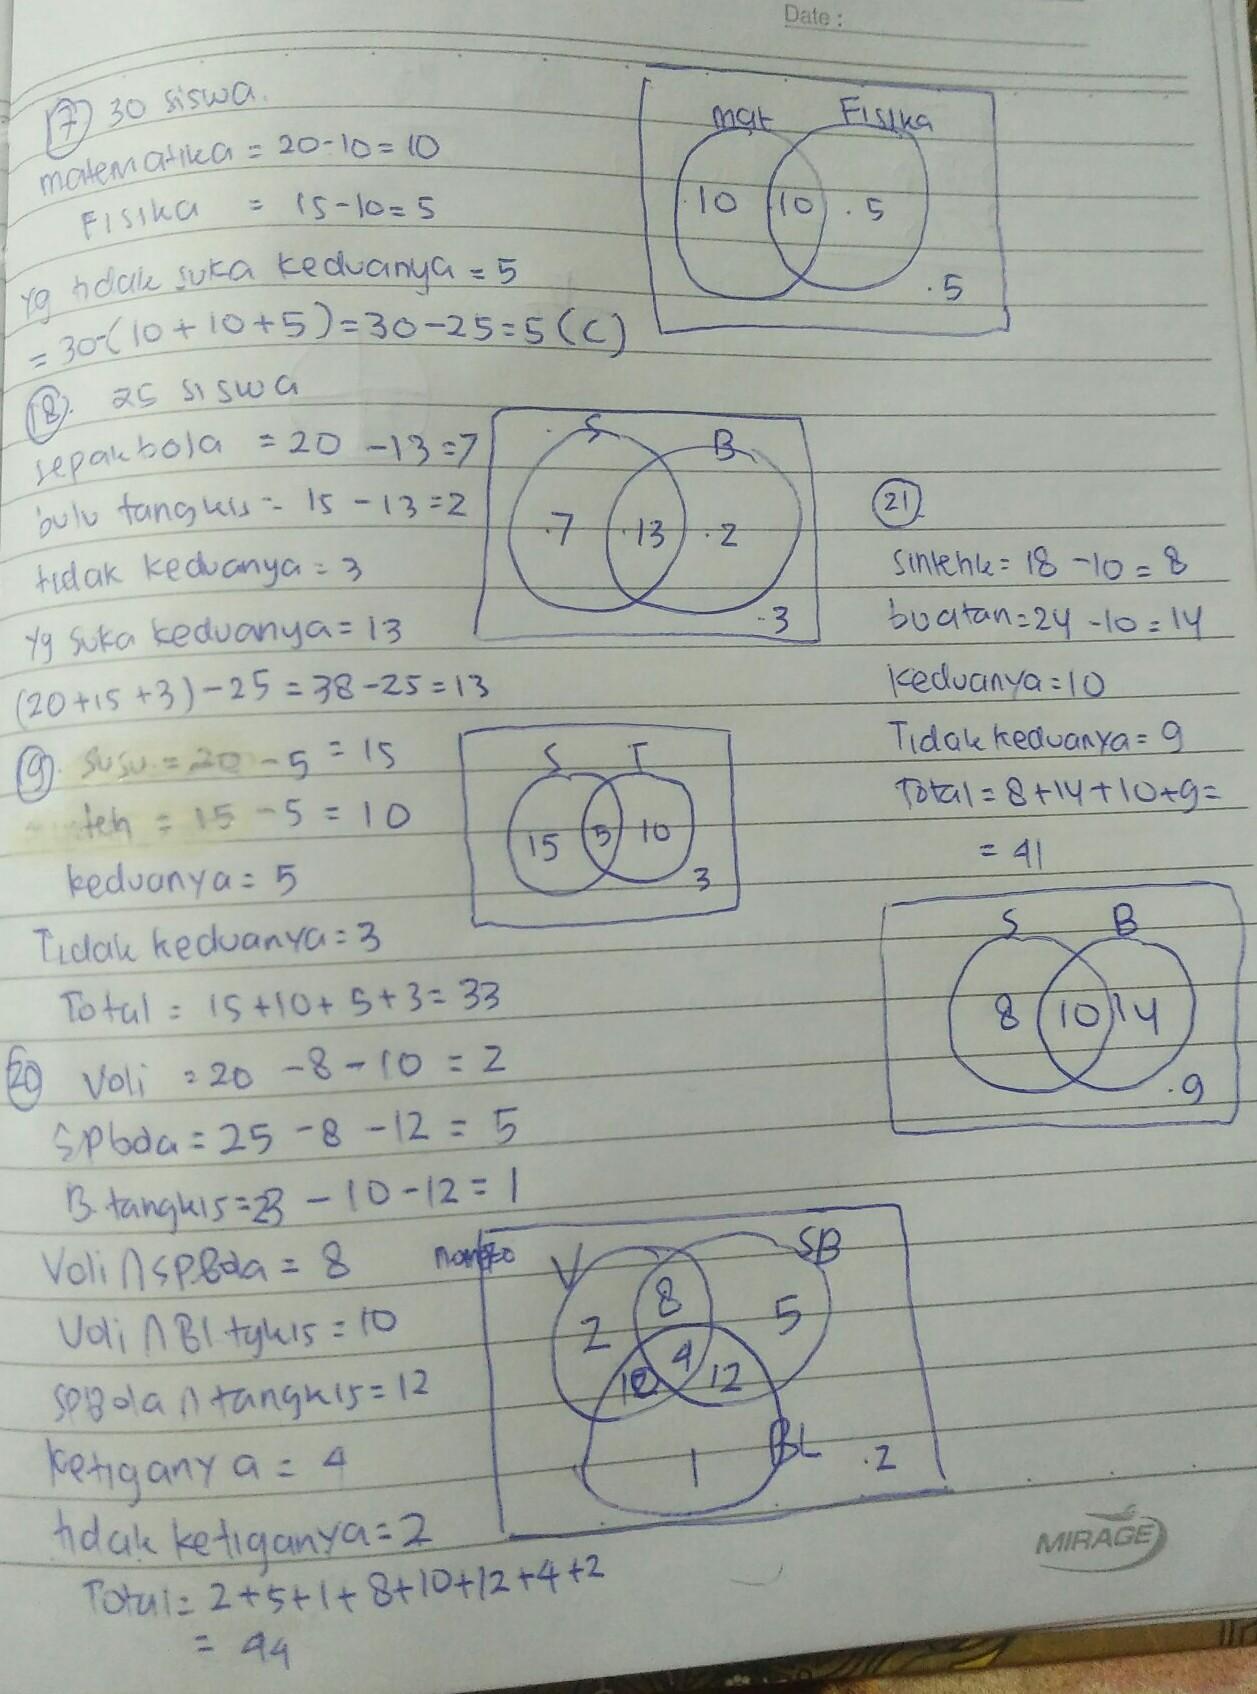 Jawaban Dari Buku Paket Matematika Kelas 7 Semester 1 Halaman 188